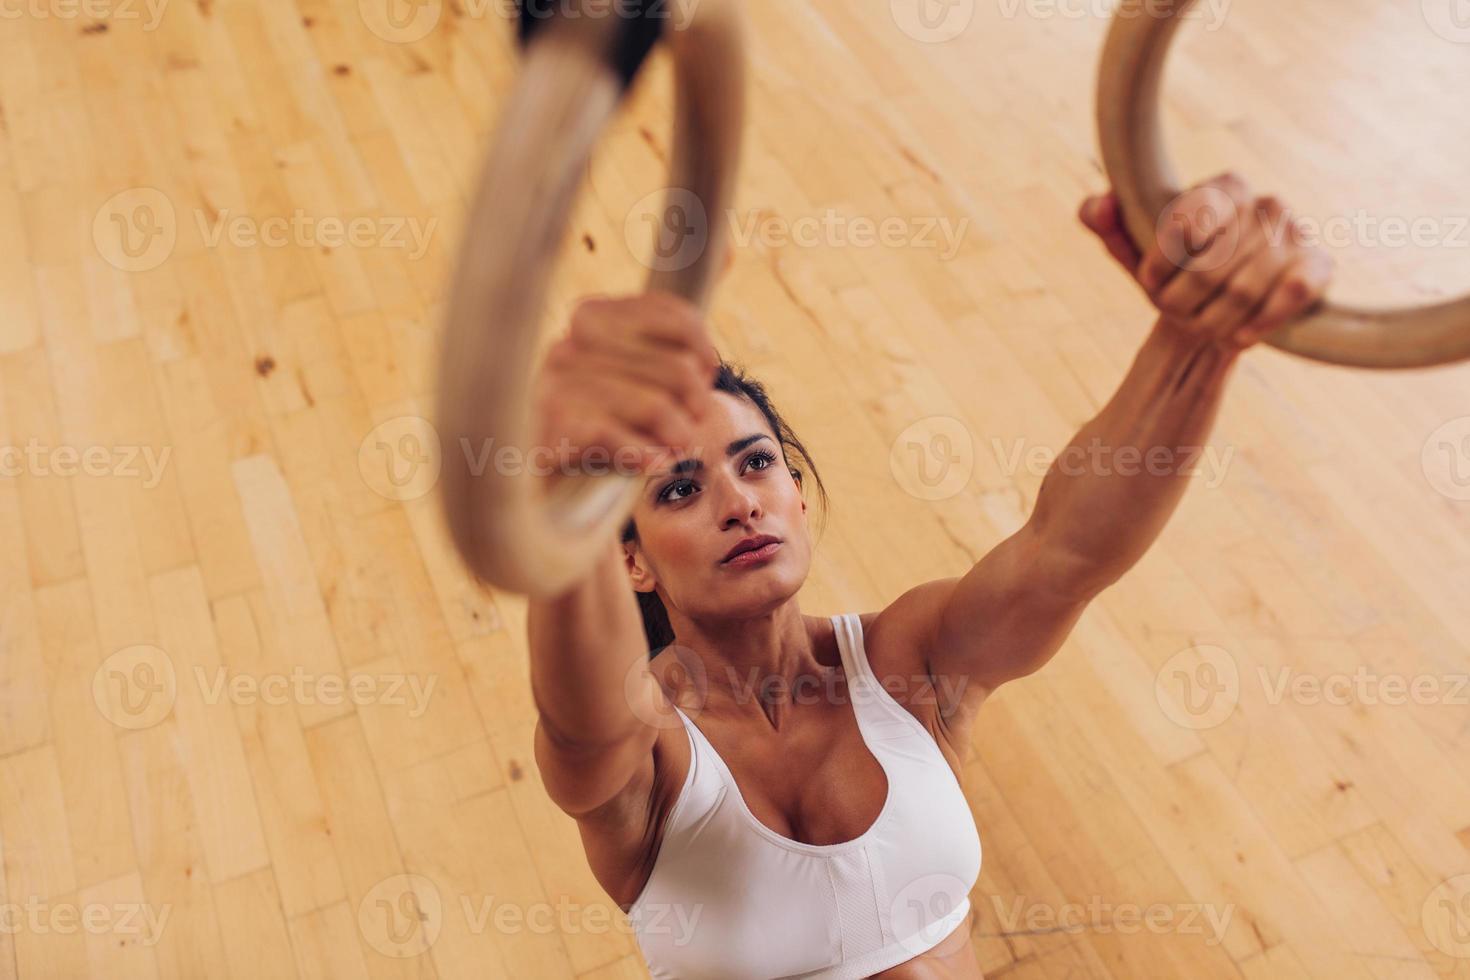 entschlossene junge Frau im Fitnessstudio mit Turnringen foto